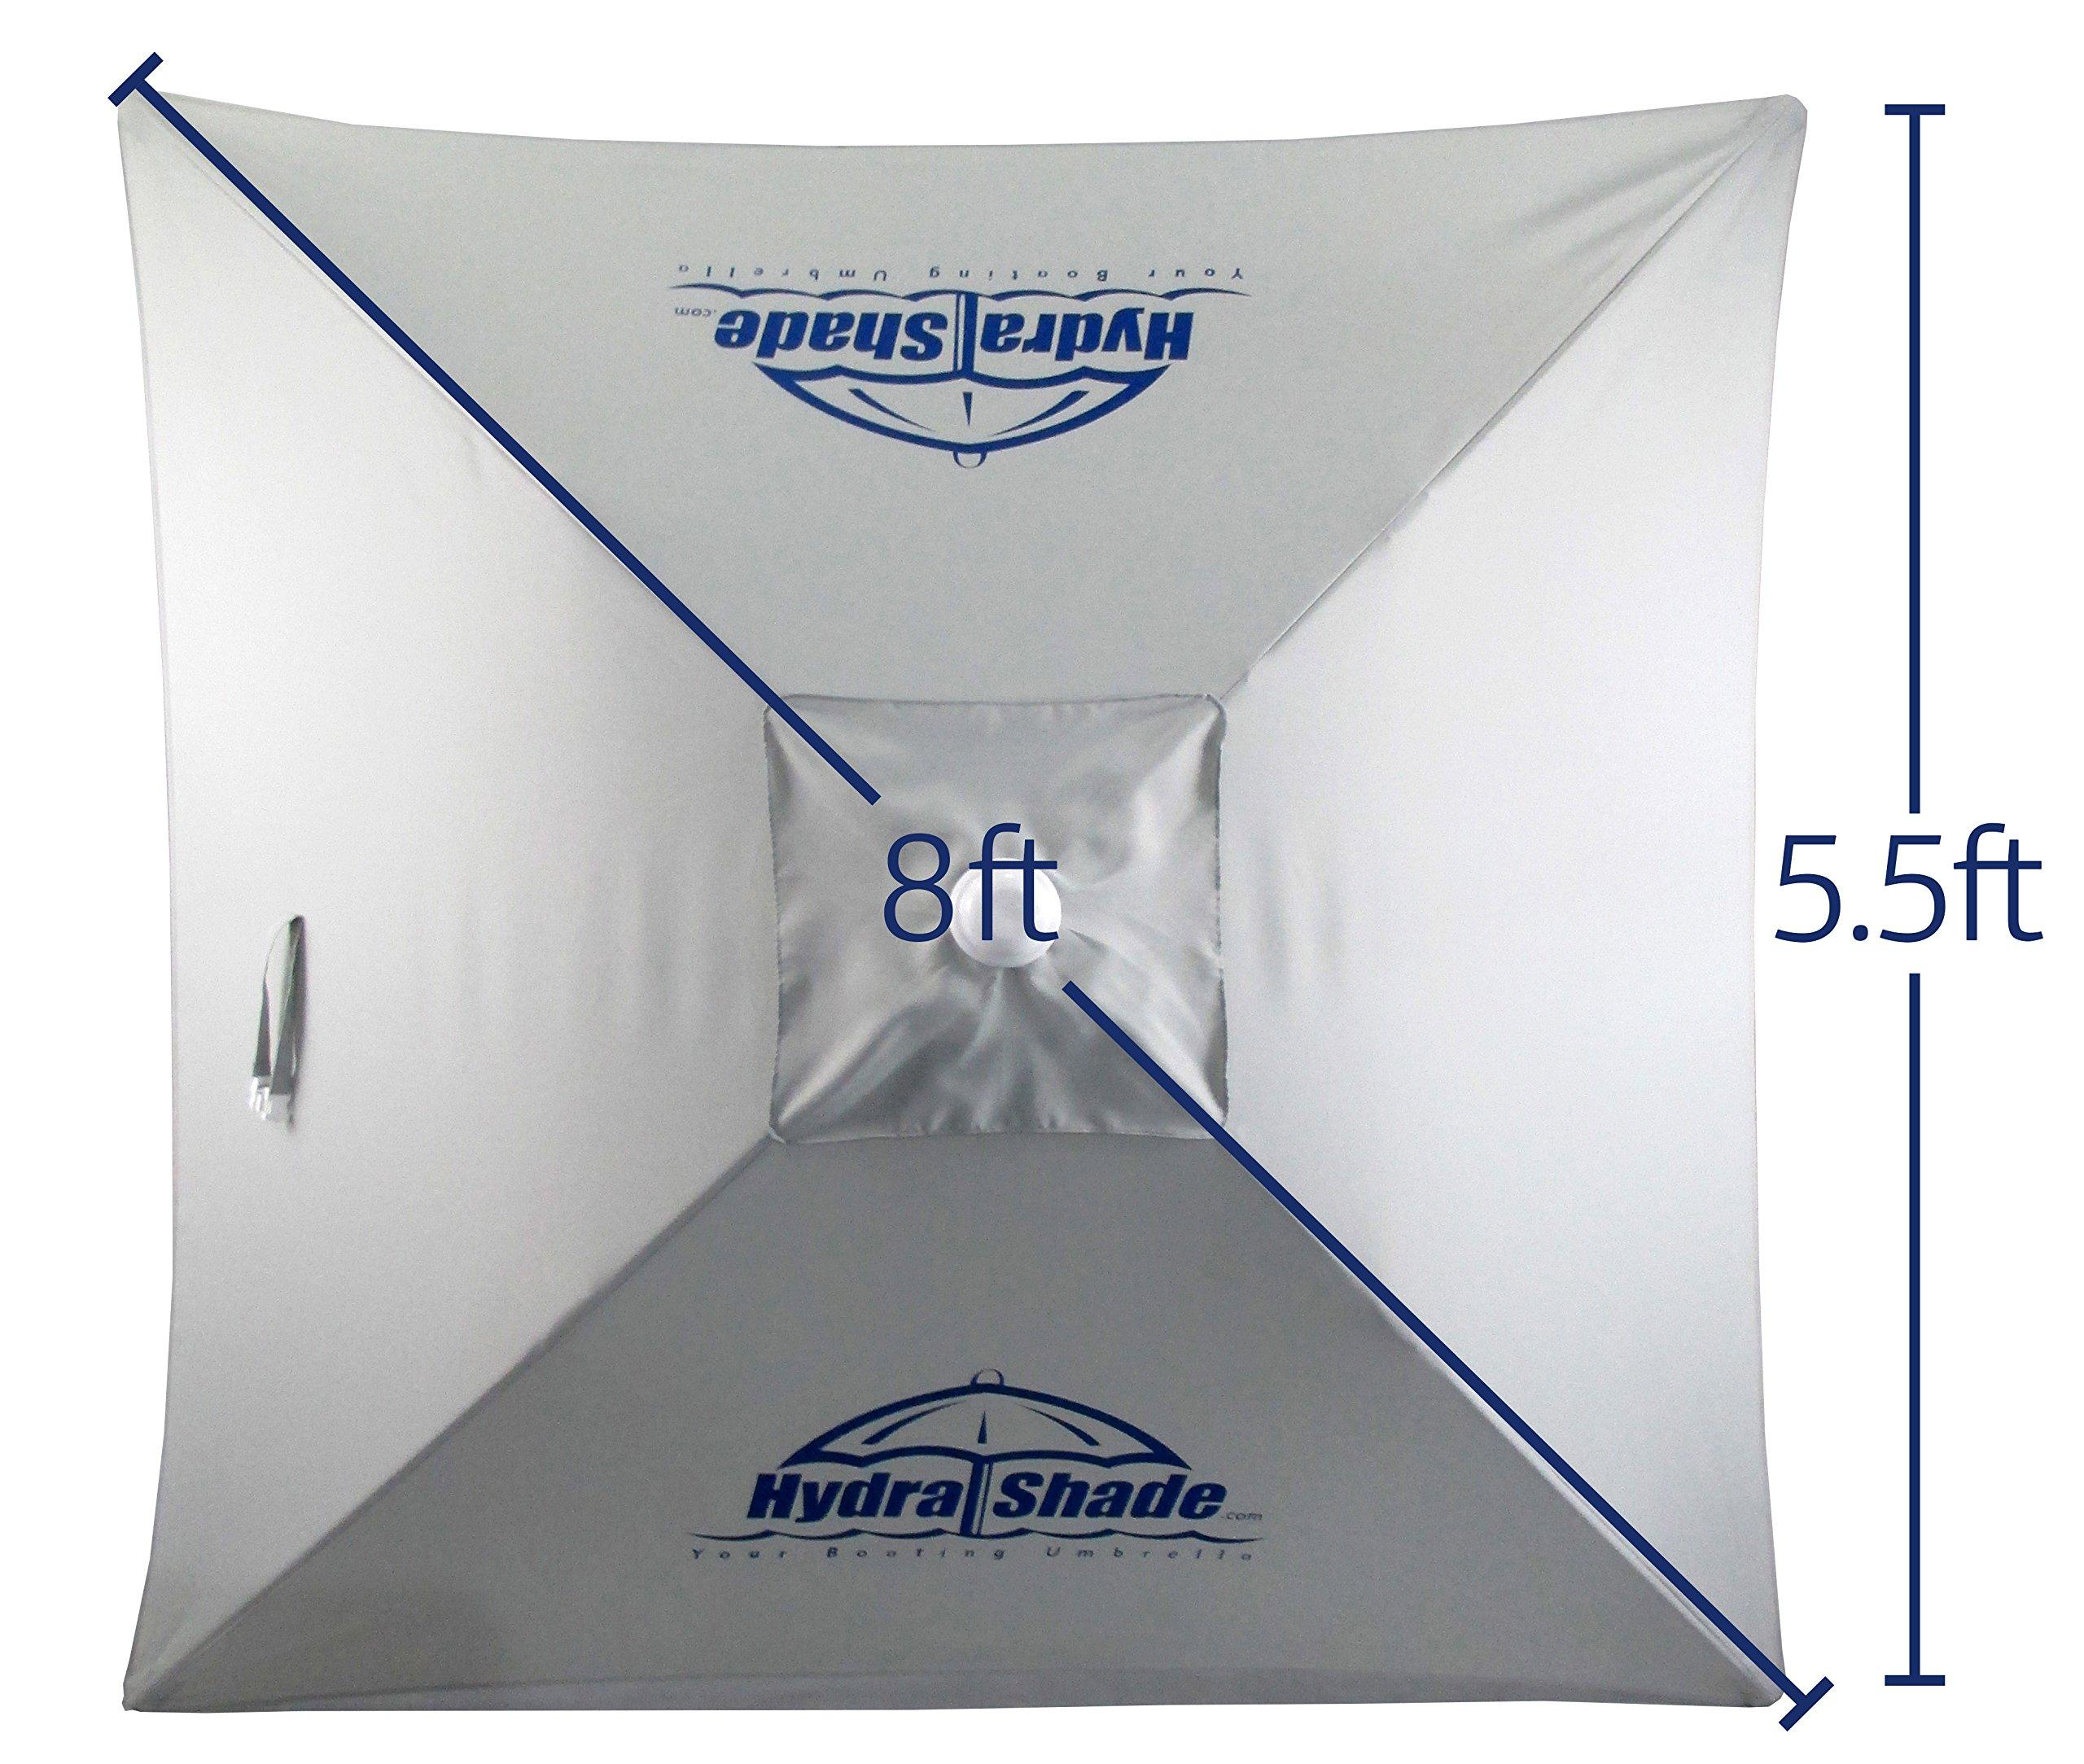 Hospitality Rattan XL-150 Hydra Shade 8' Square Boating & Beach Umbrella Kit, White by Hospitality Rattan (Image #10)